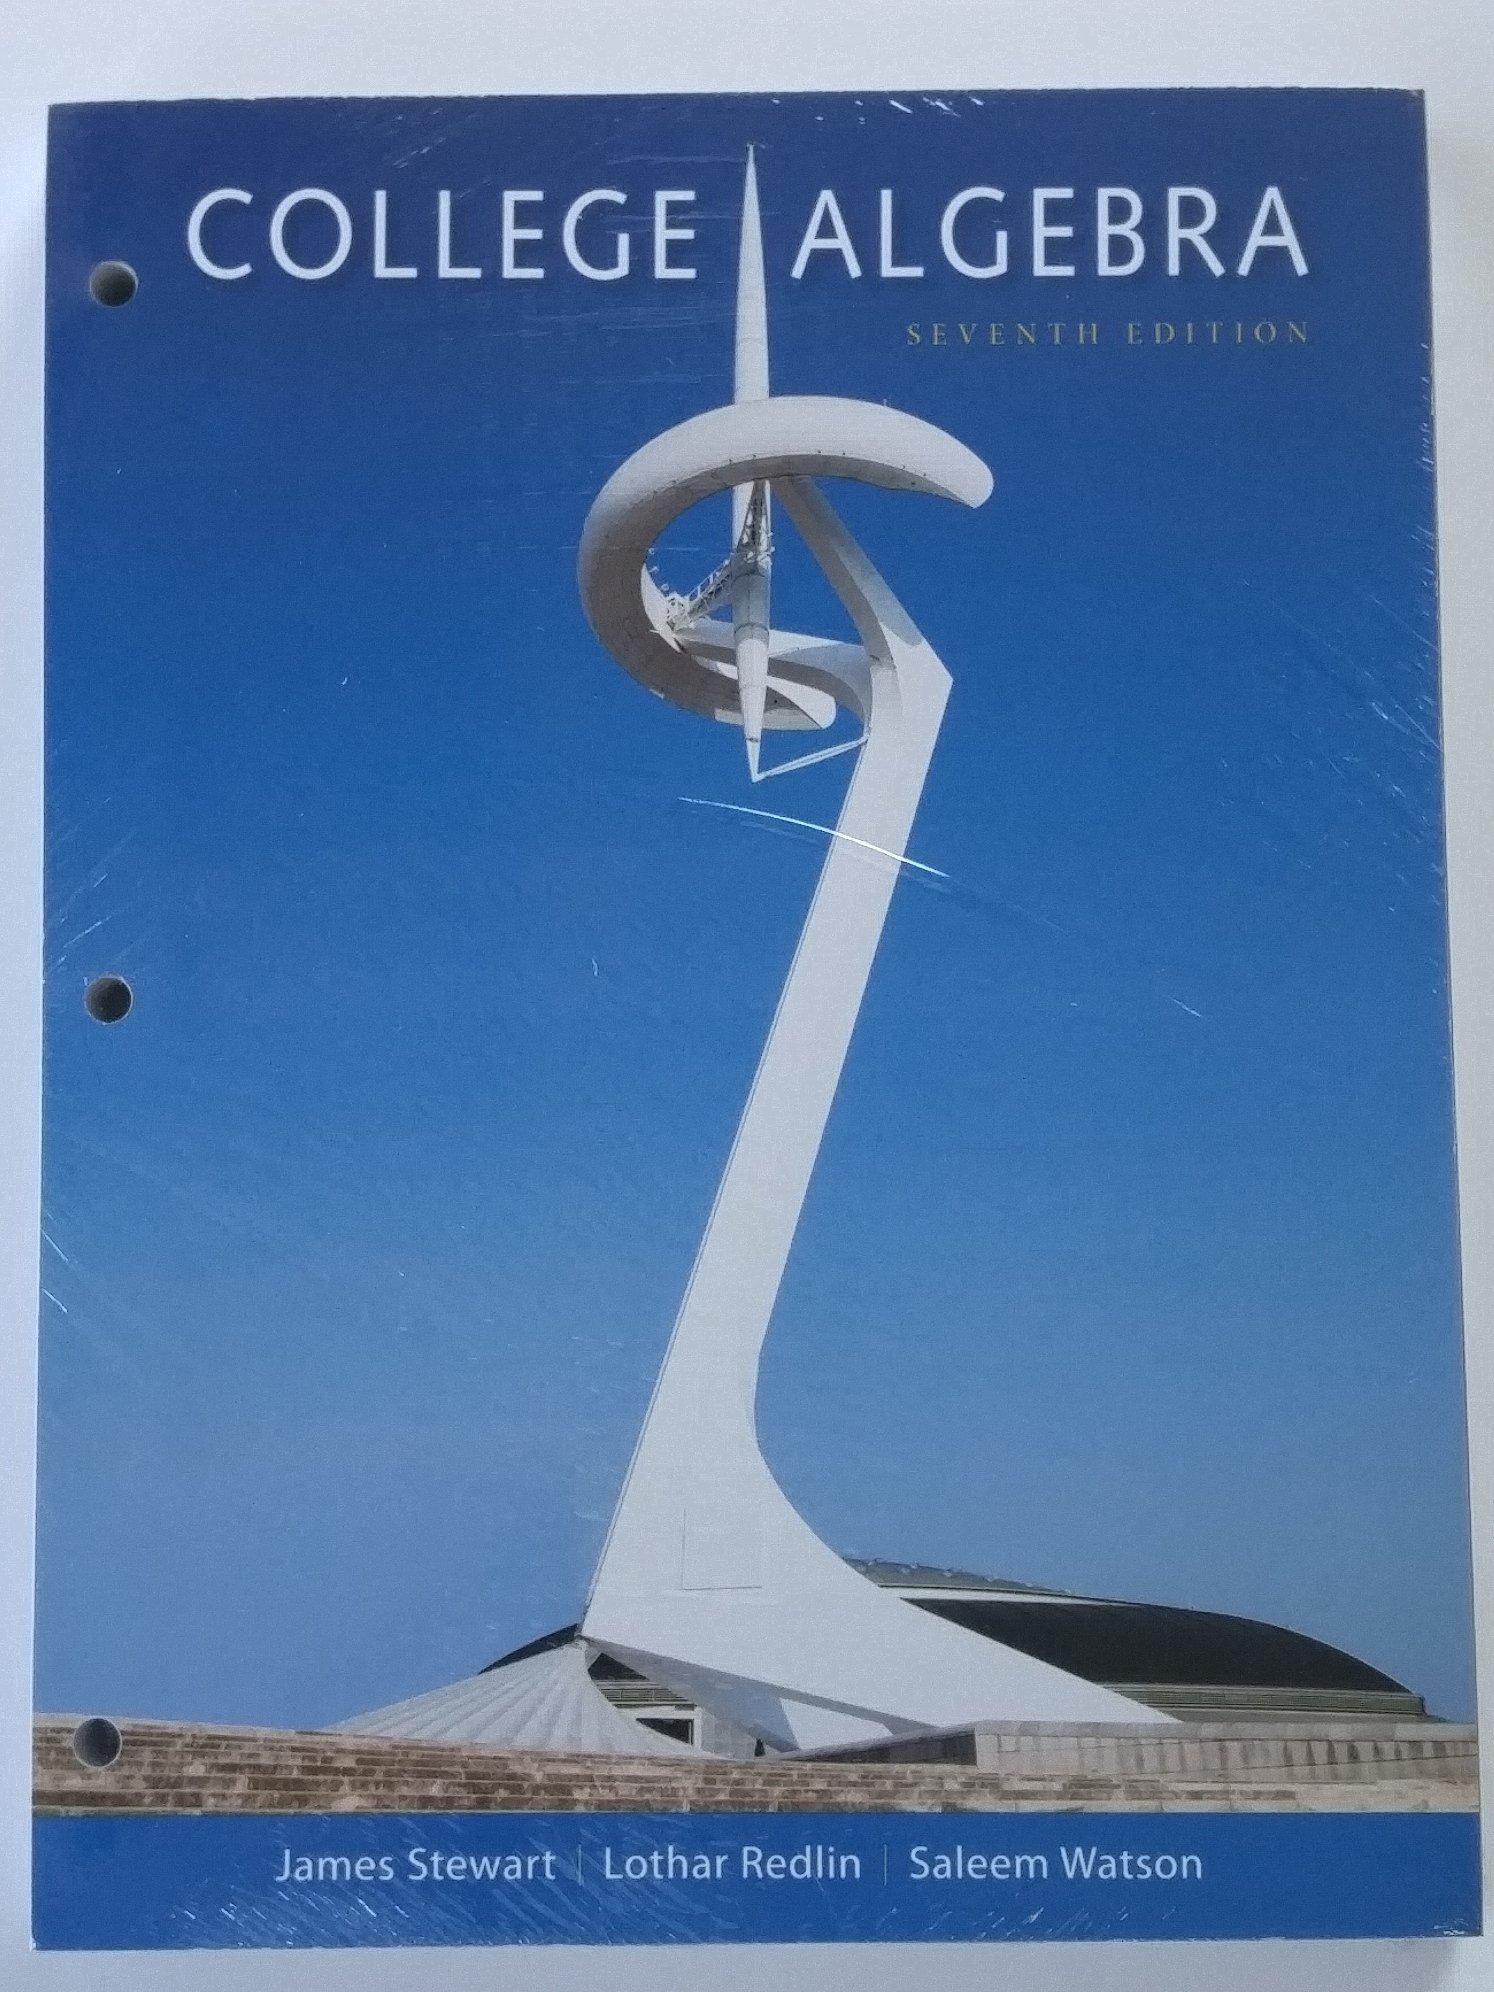 College Algebra 7th Edition Loose Leaf James Stewart: 9781305586031:  Amazon.com: Books